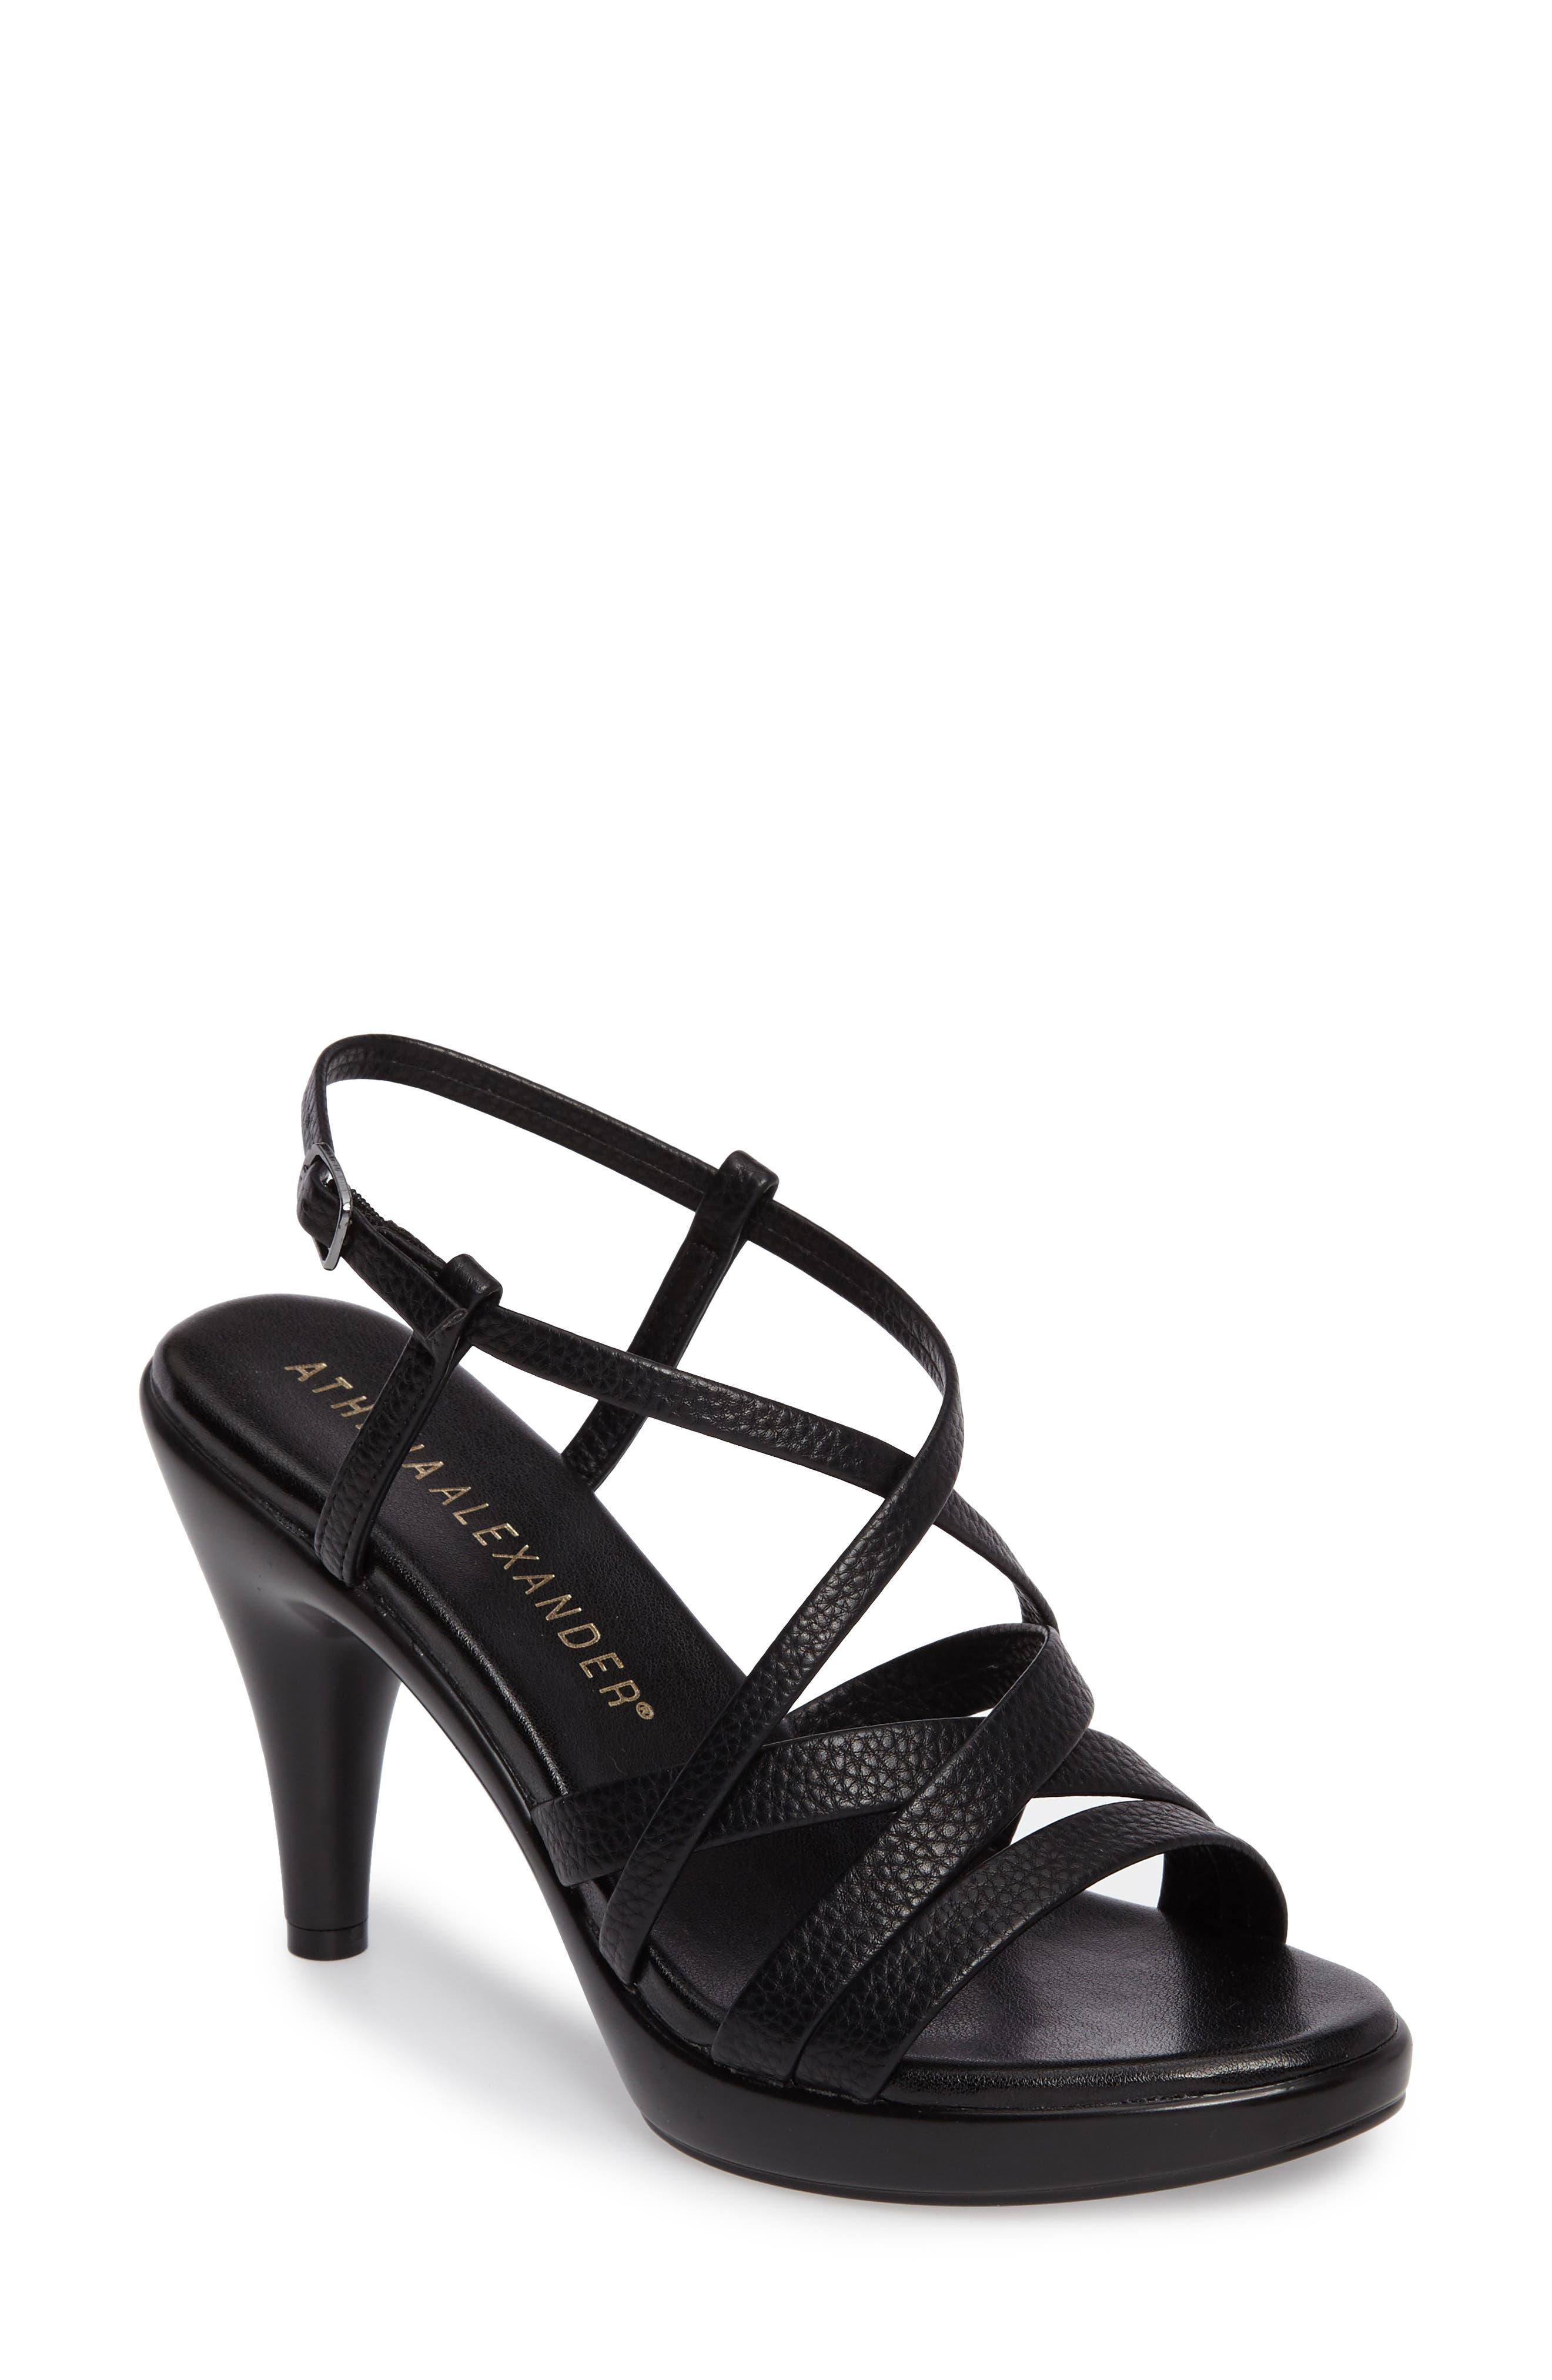 Alternate Image 1 Selected - Athena Alexander Gabrielaa Cross Strap Sandal (Women)